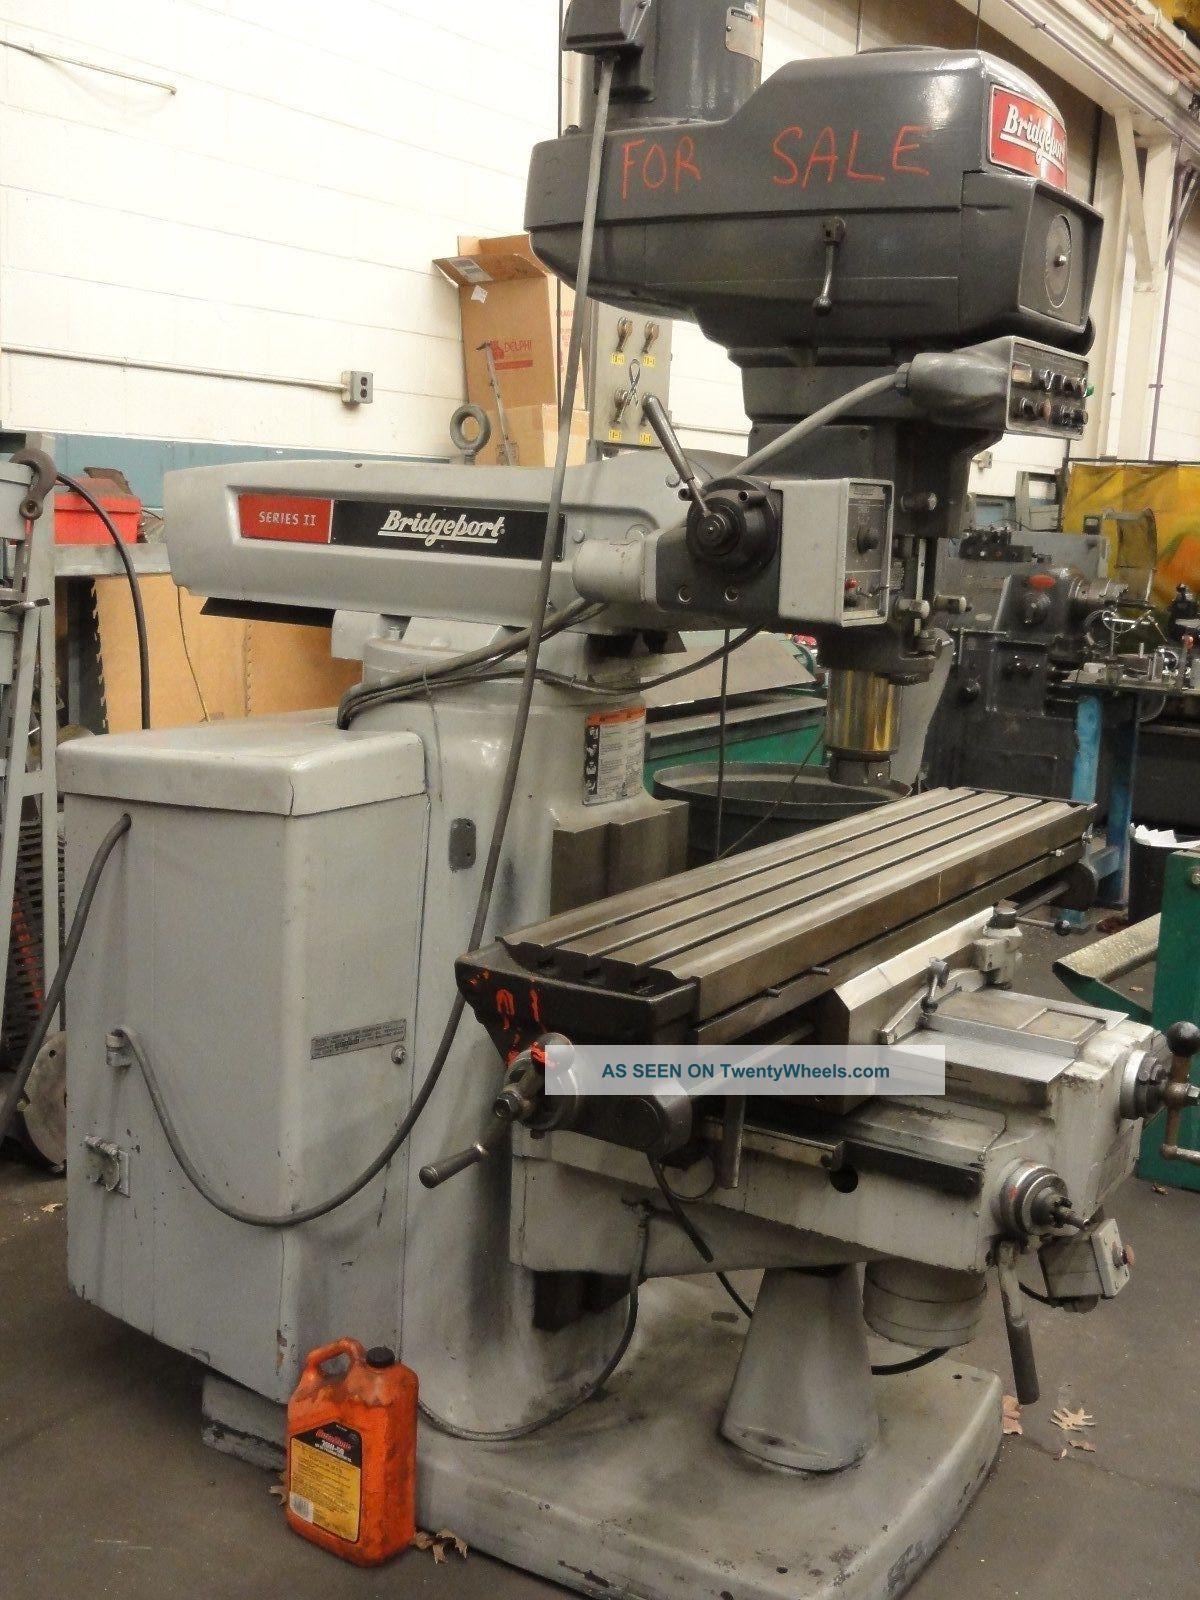 Bridgeport Series Ii 2 Mill Milling Machines photo